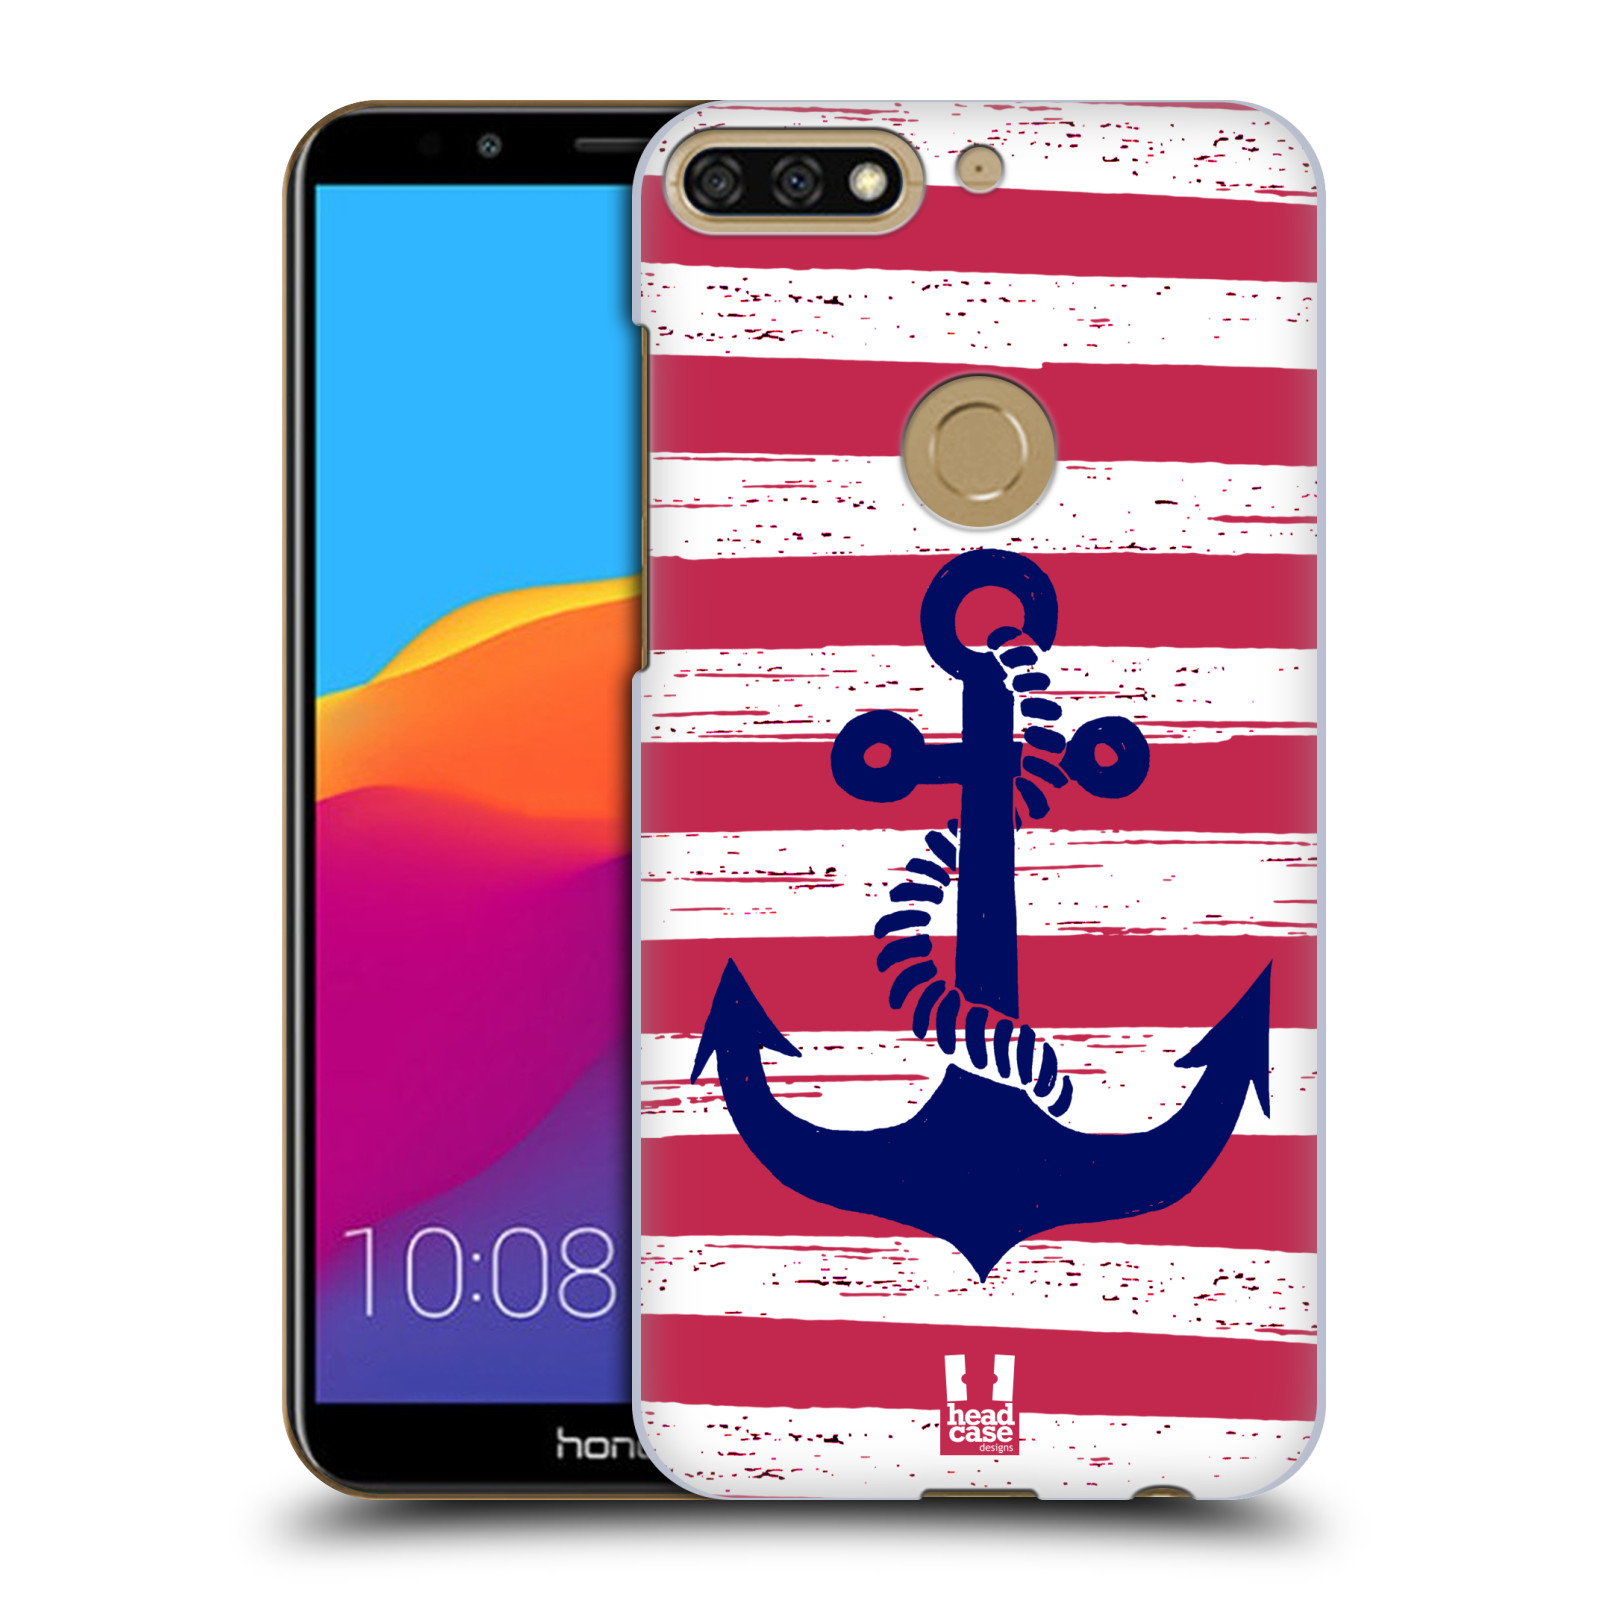 Plastové pouzdro na mobil Huawei Y7 Prime 2018 - Head Case - KOTVA S PRUHY